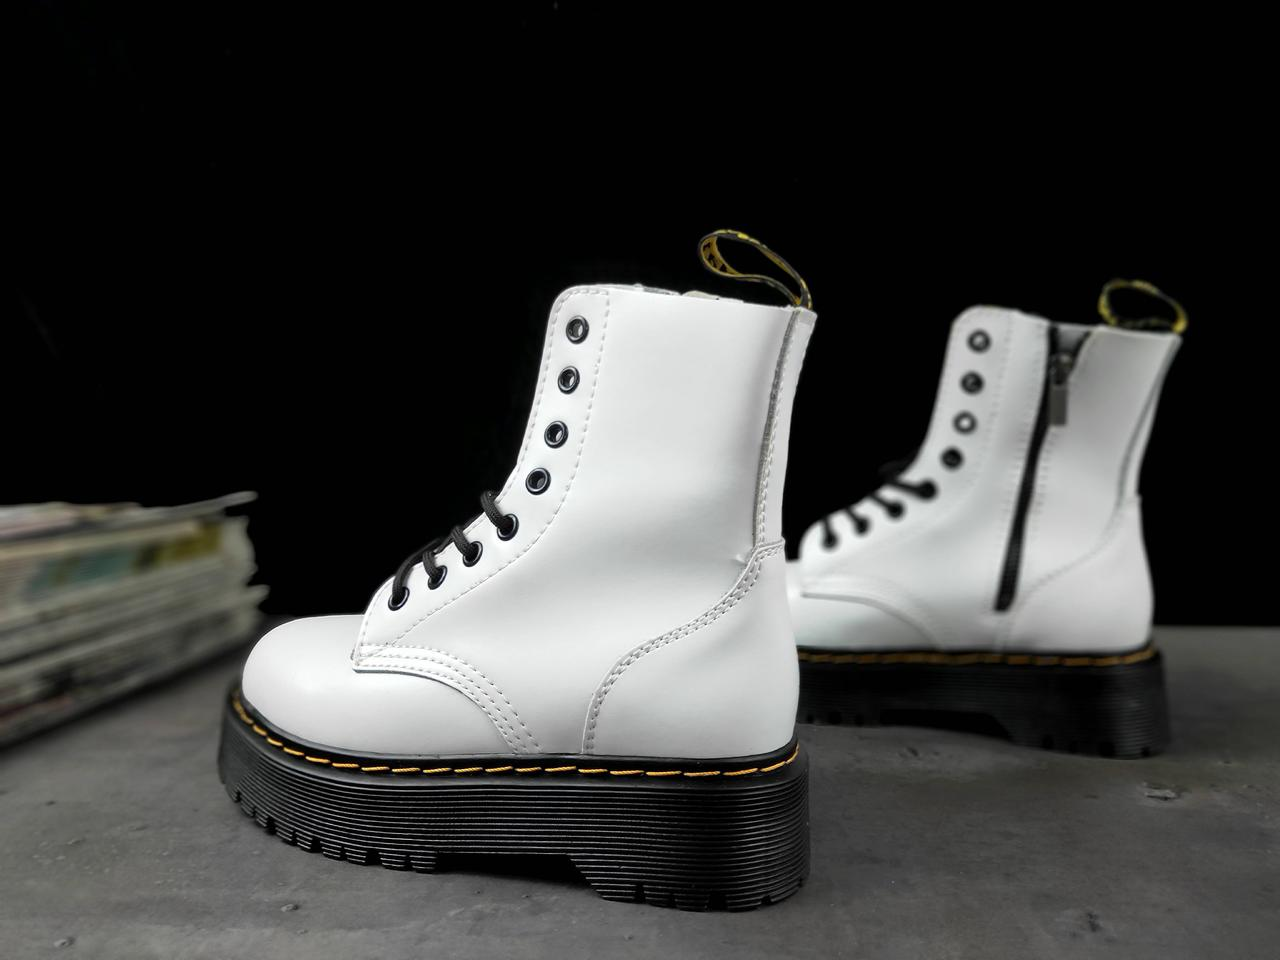 Женские Ботинки Dr. Martens White High sole (реплика)